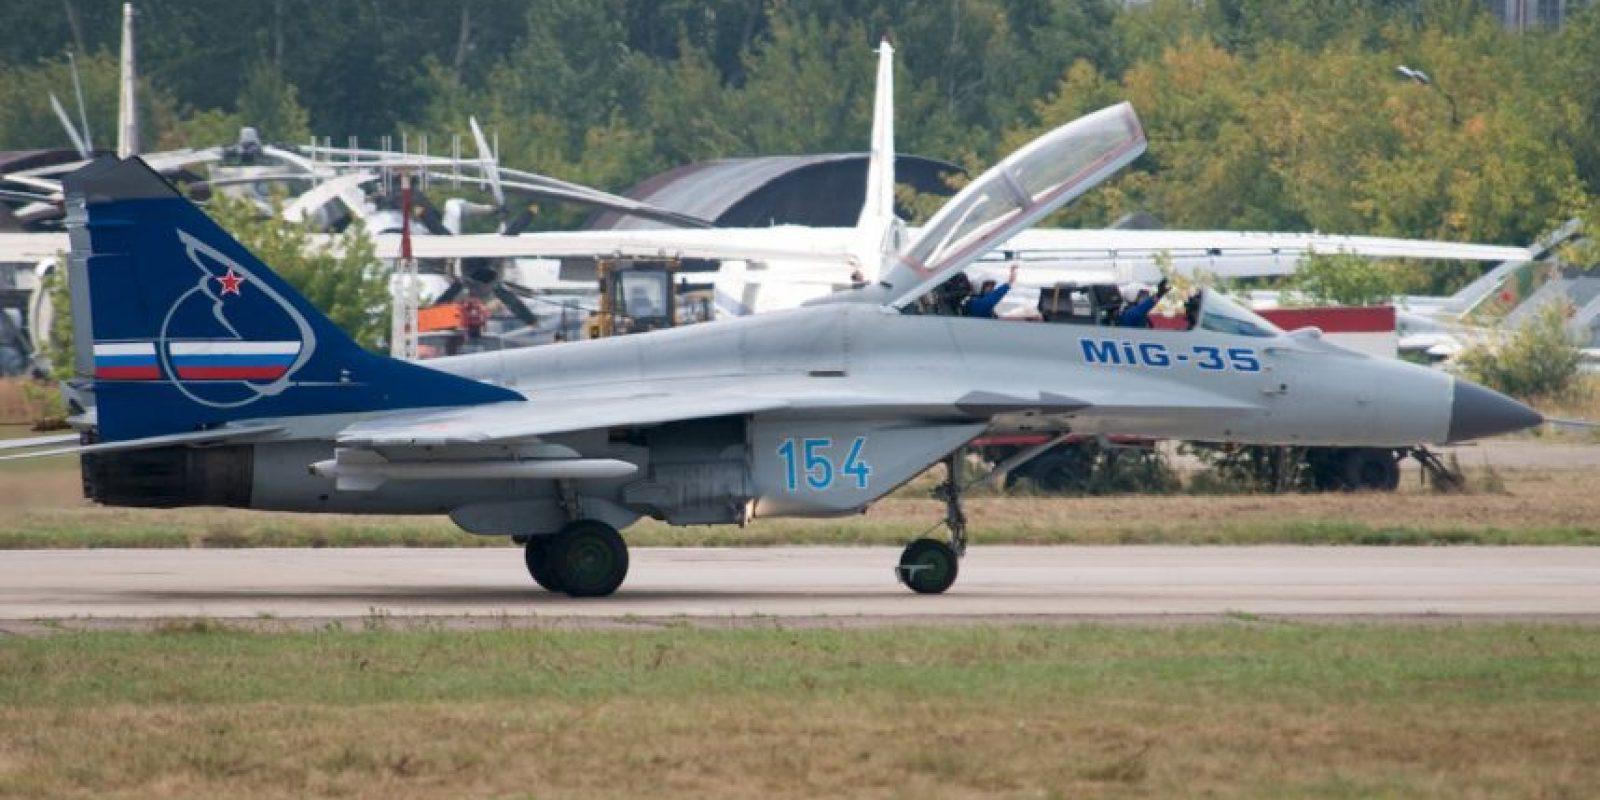 8. MiG-35 Fulcrum-F. Velocidad máxima de Mach 2,25 (2.756,3 km/h) Foto:Wikimedia